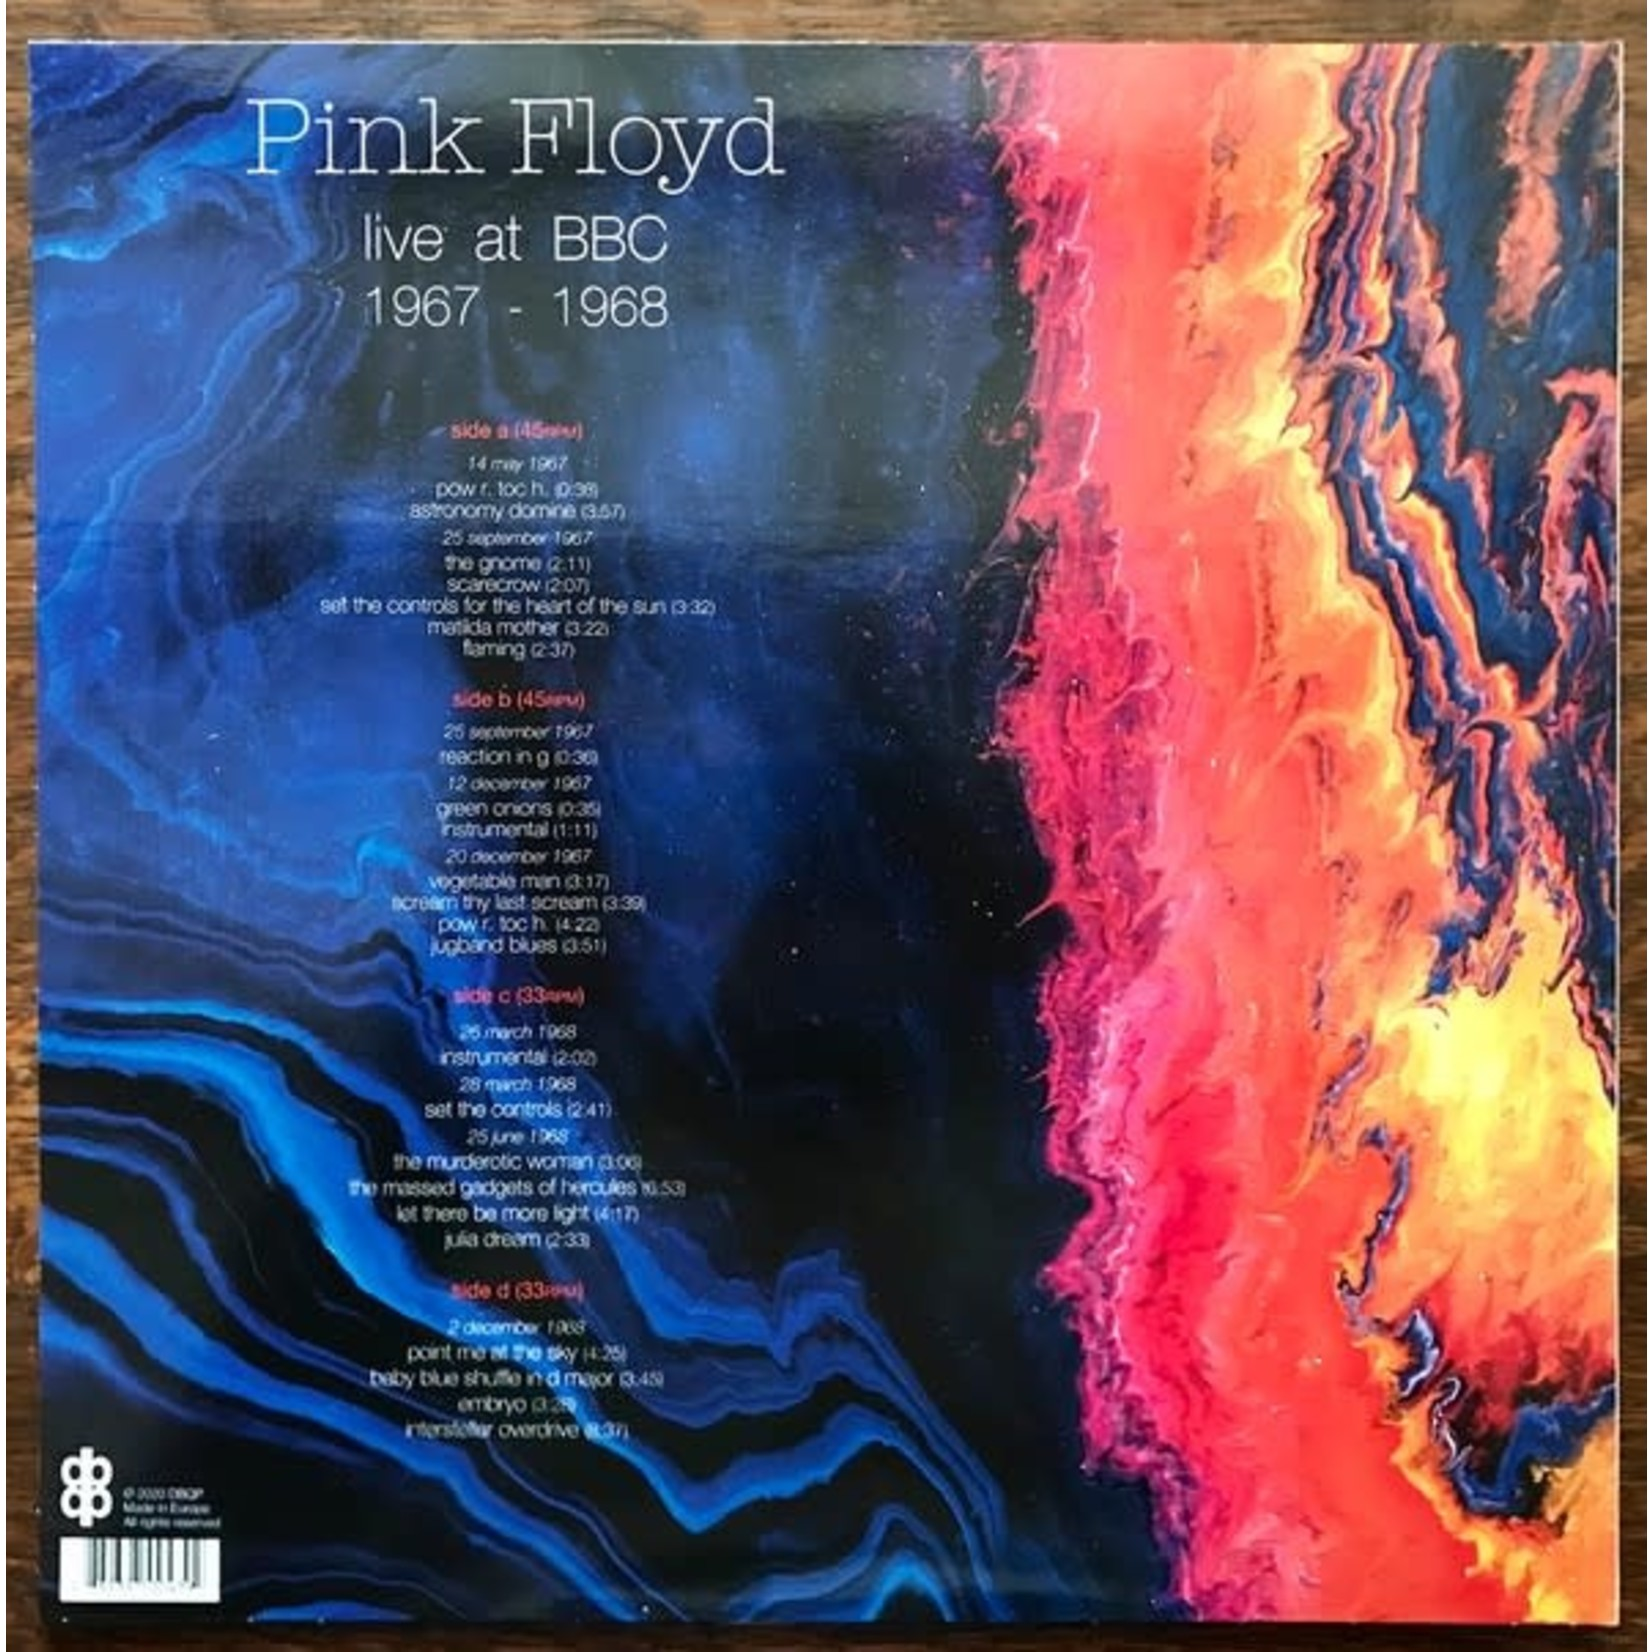 PINK FLOYD BBC 1967-1968 (2LP)